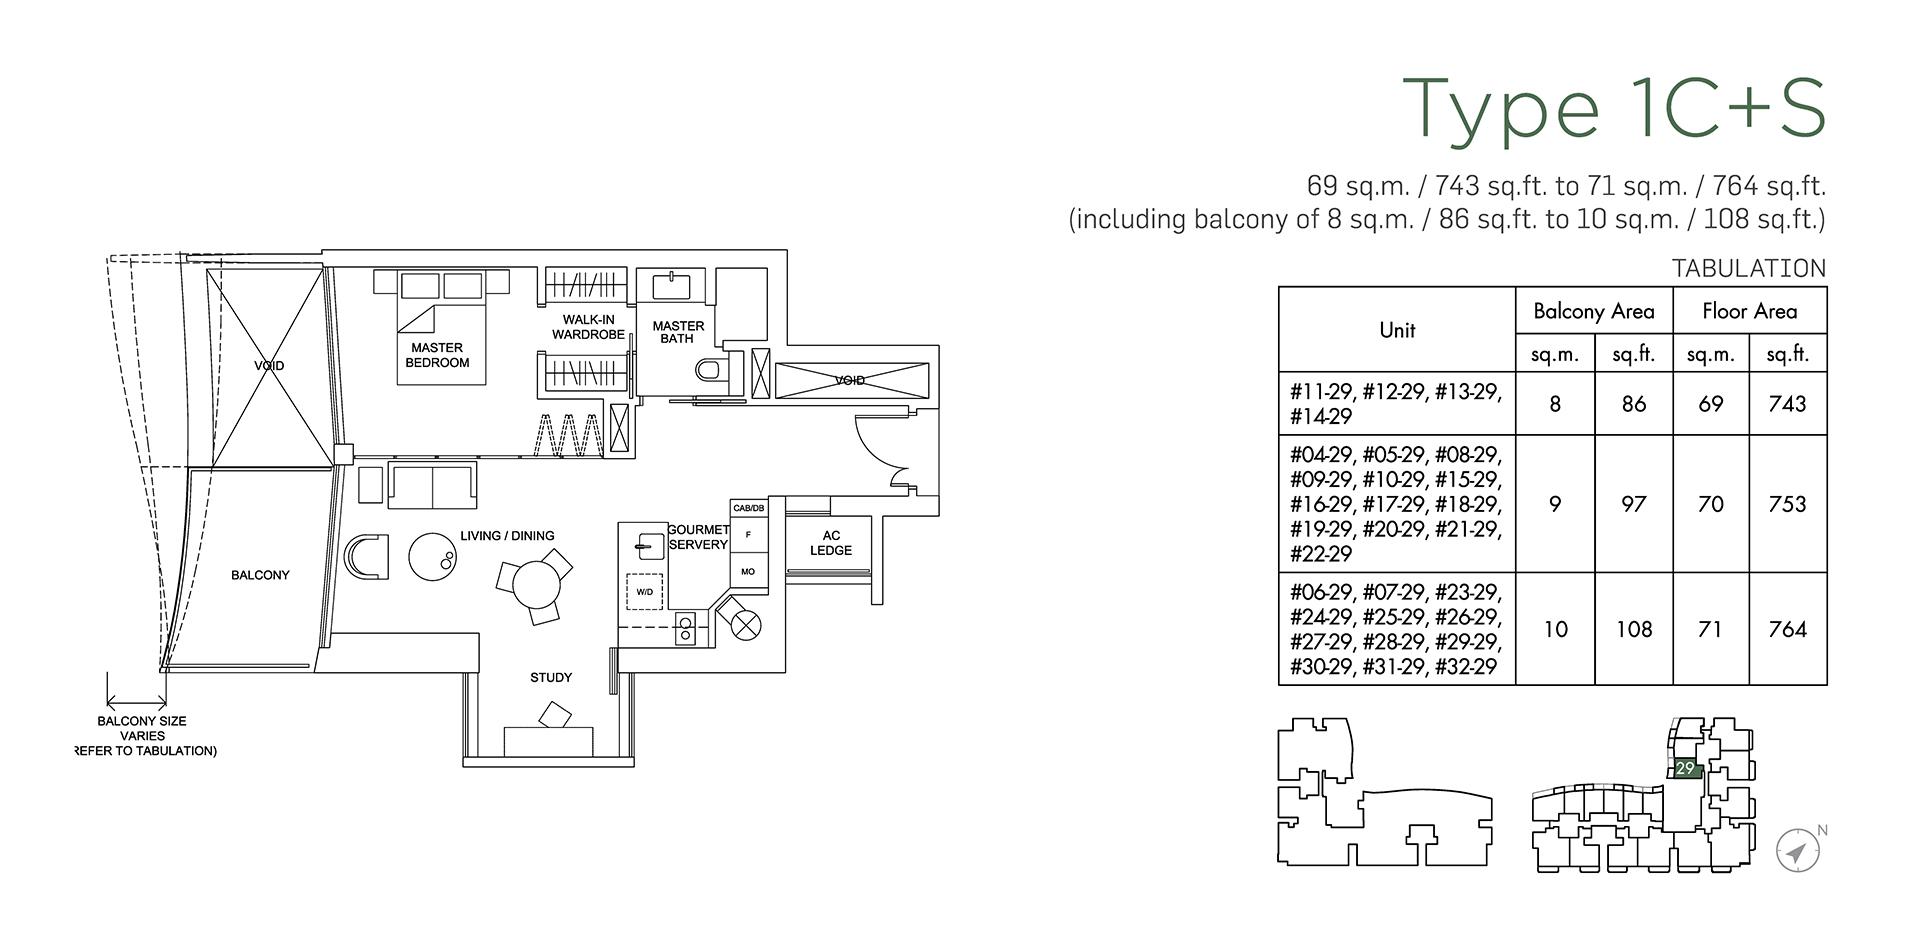 Marina One Residences Floor Plan 1 Bedroom + Study Type1C+S